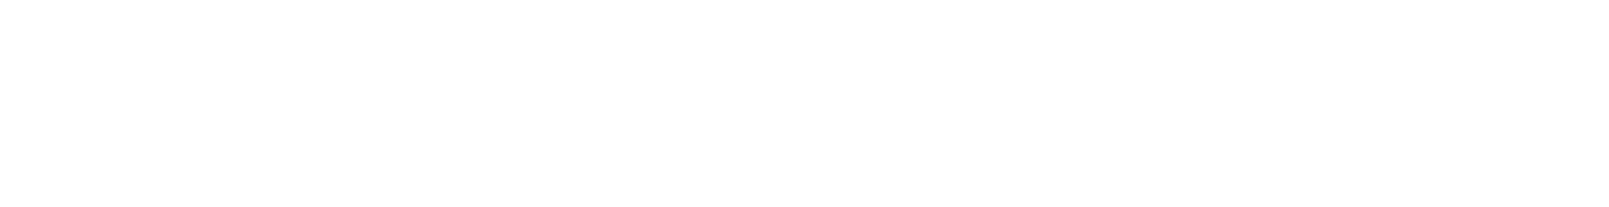 Pacific Surfliner_WHITE_horizontal logo_®.png